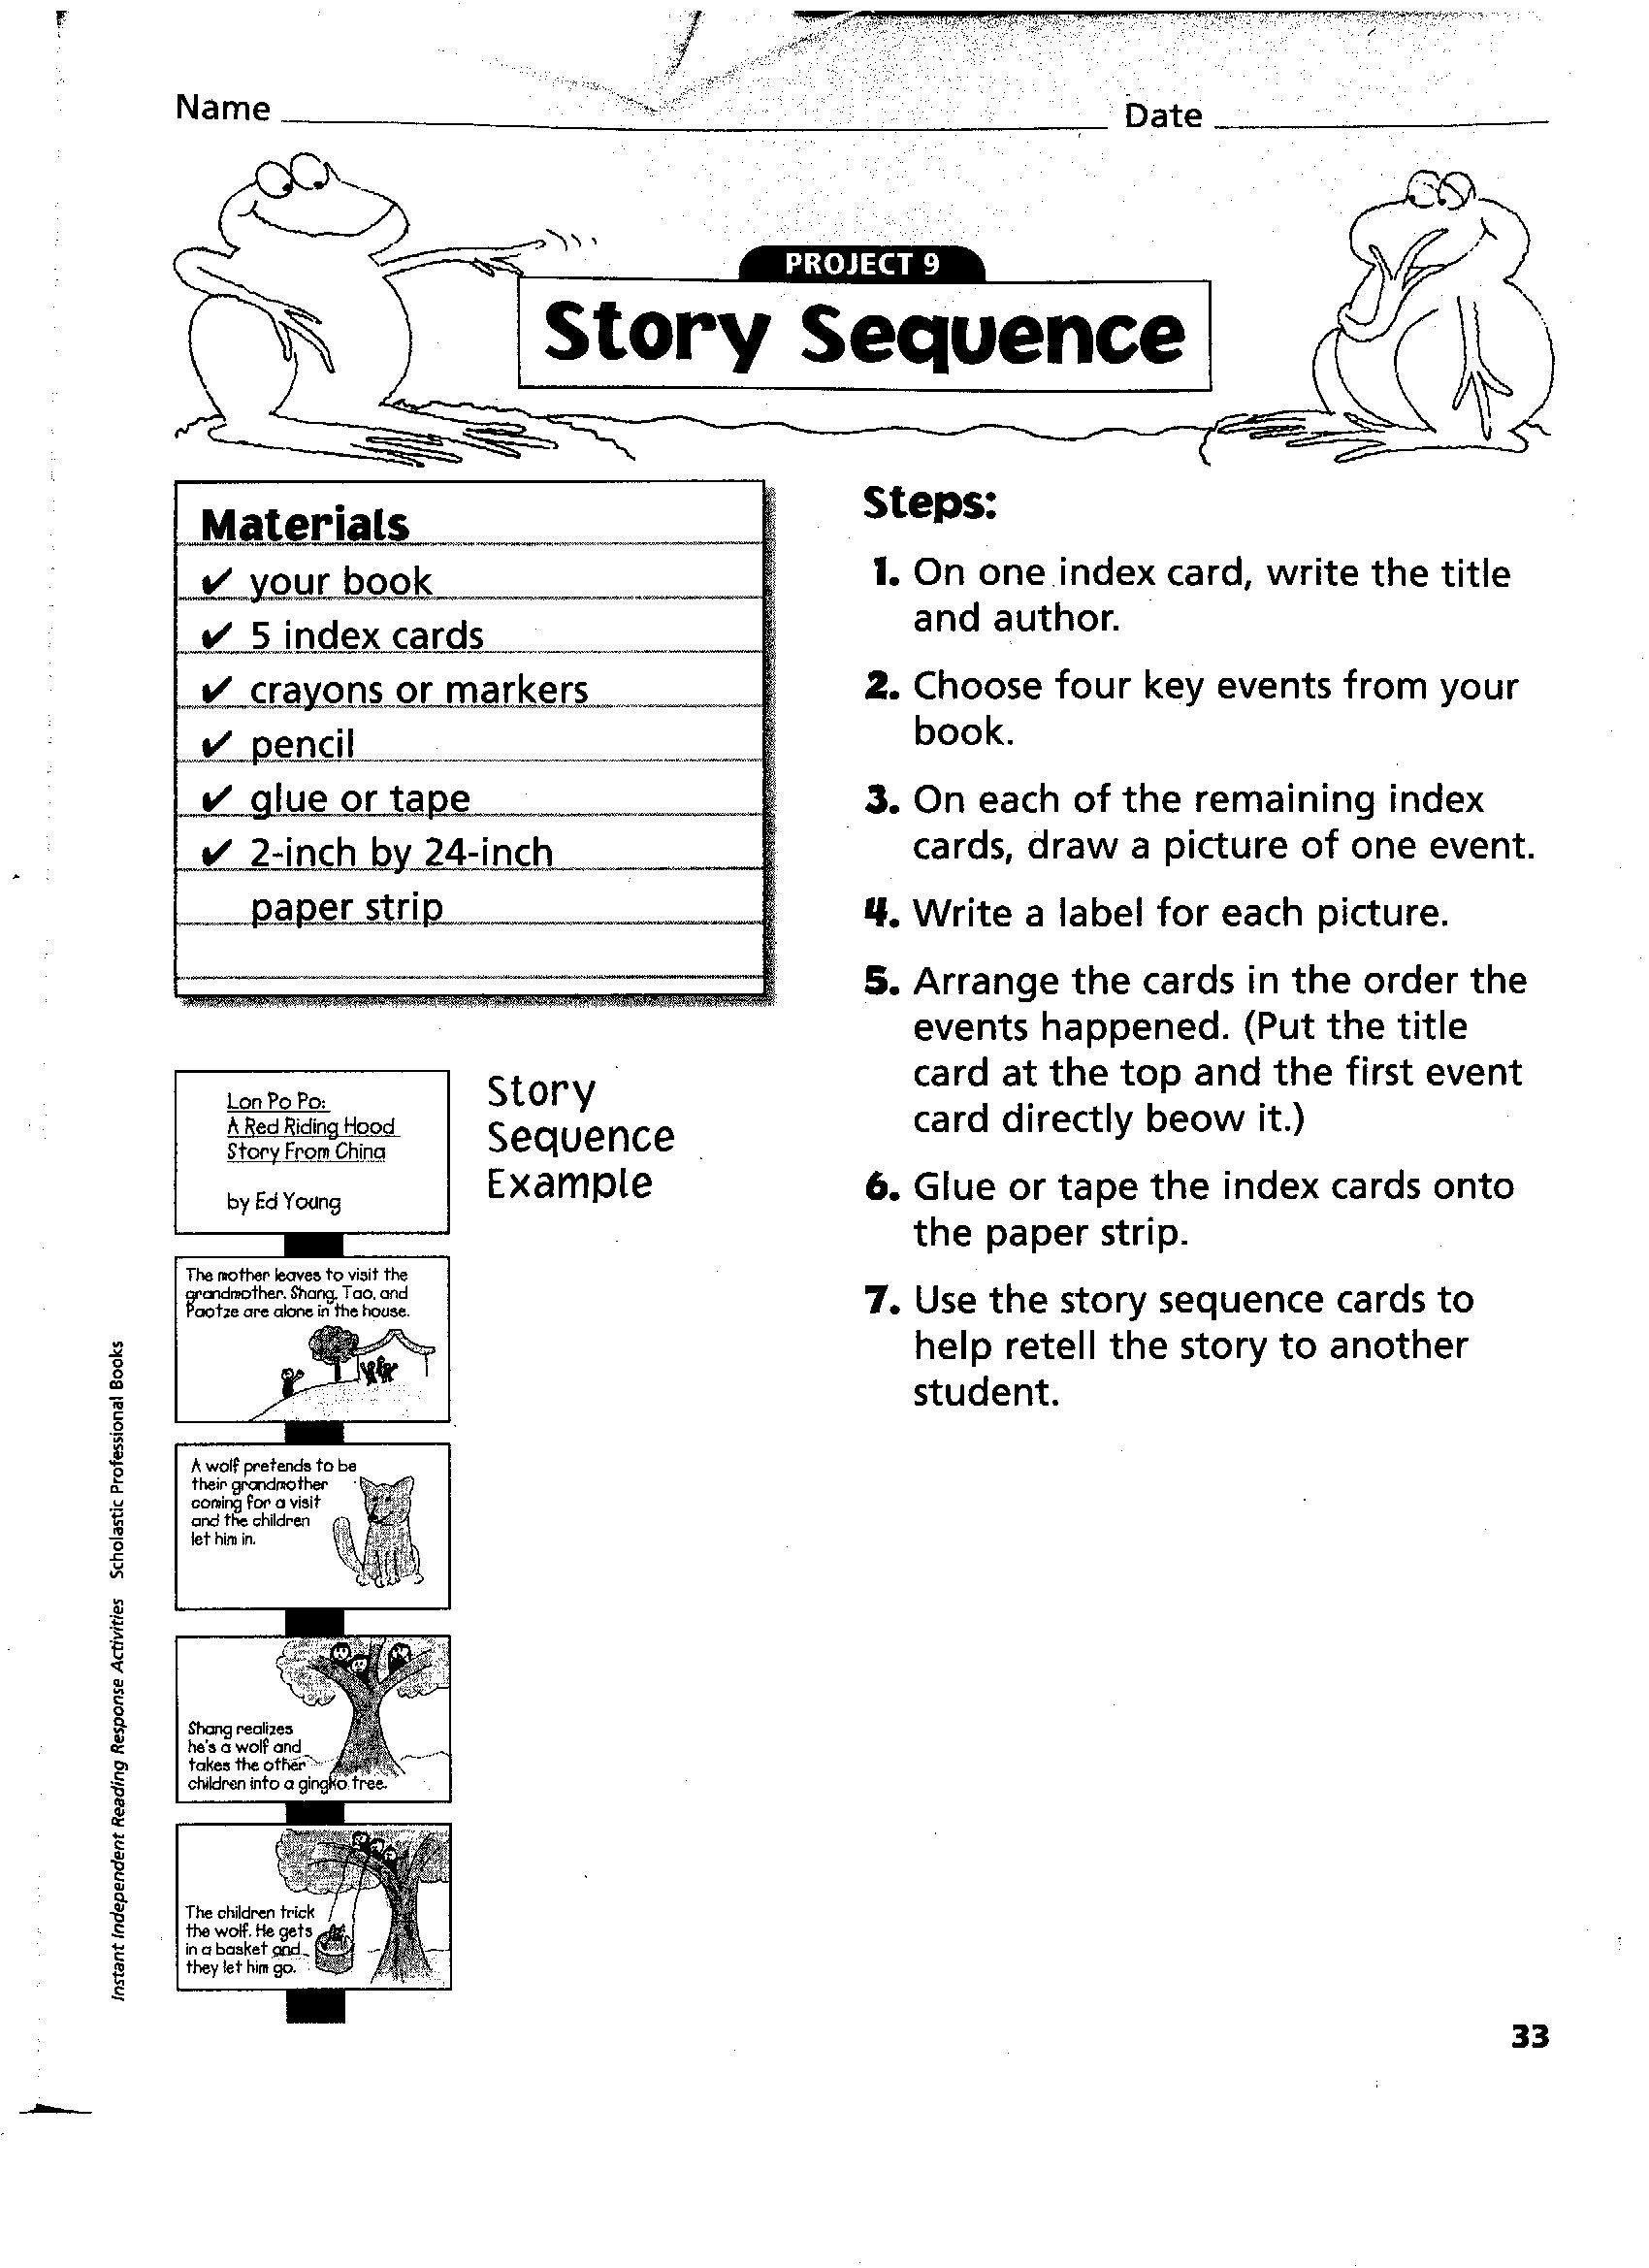 Sequencing Worksheet 2nd Grade Sequence Events Worksheet 3rd In 2020 Sequencing Worksheets Main Idea Worksheet Kindergarten Reading Worksheets